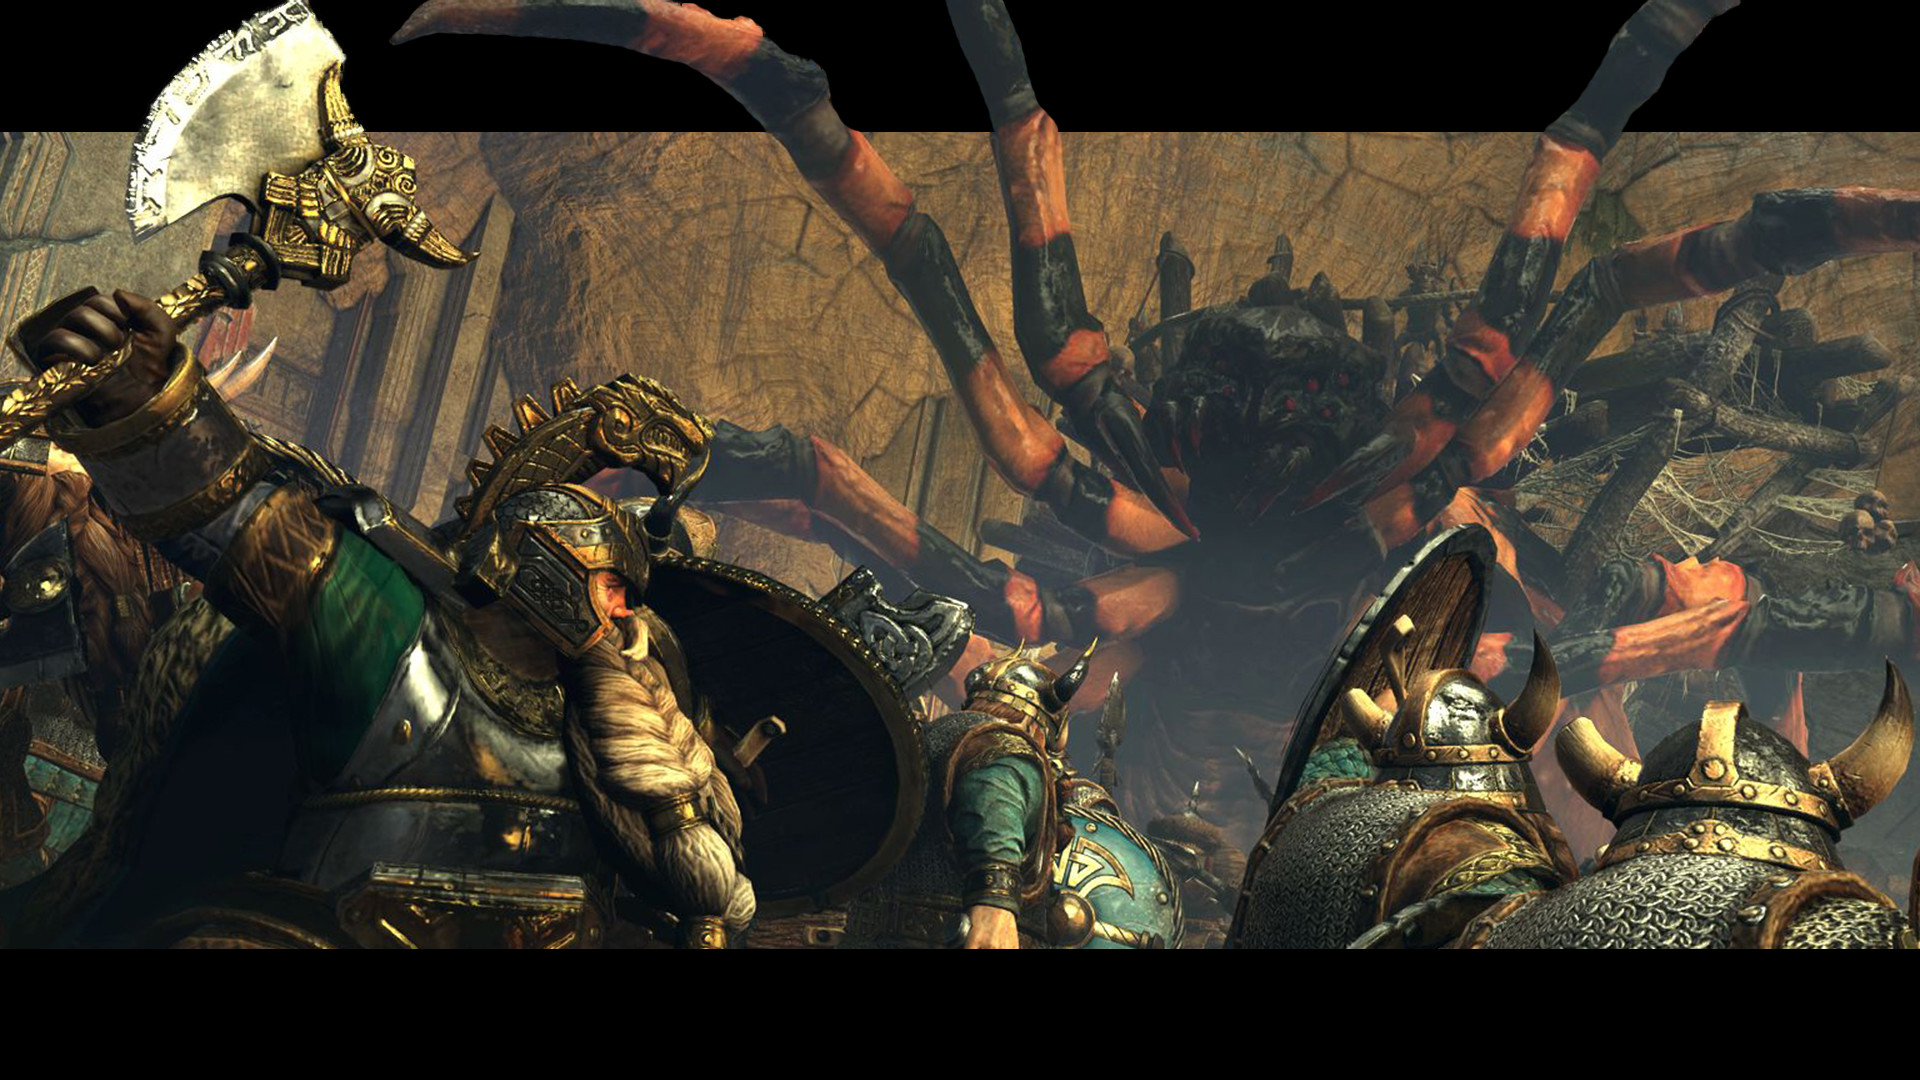 More Total War: Warhammer Wallpapers 1920×1080